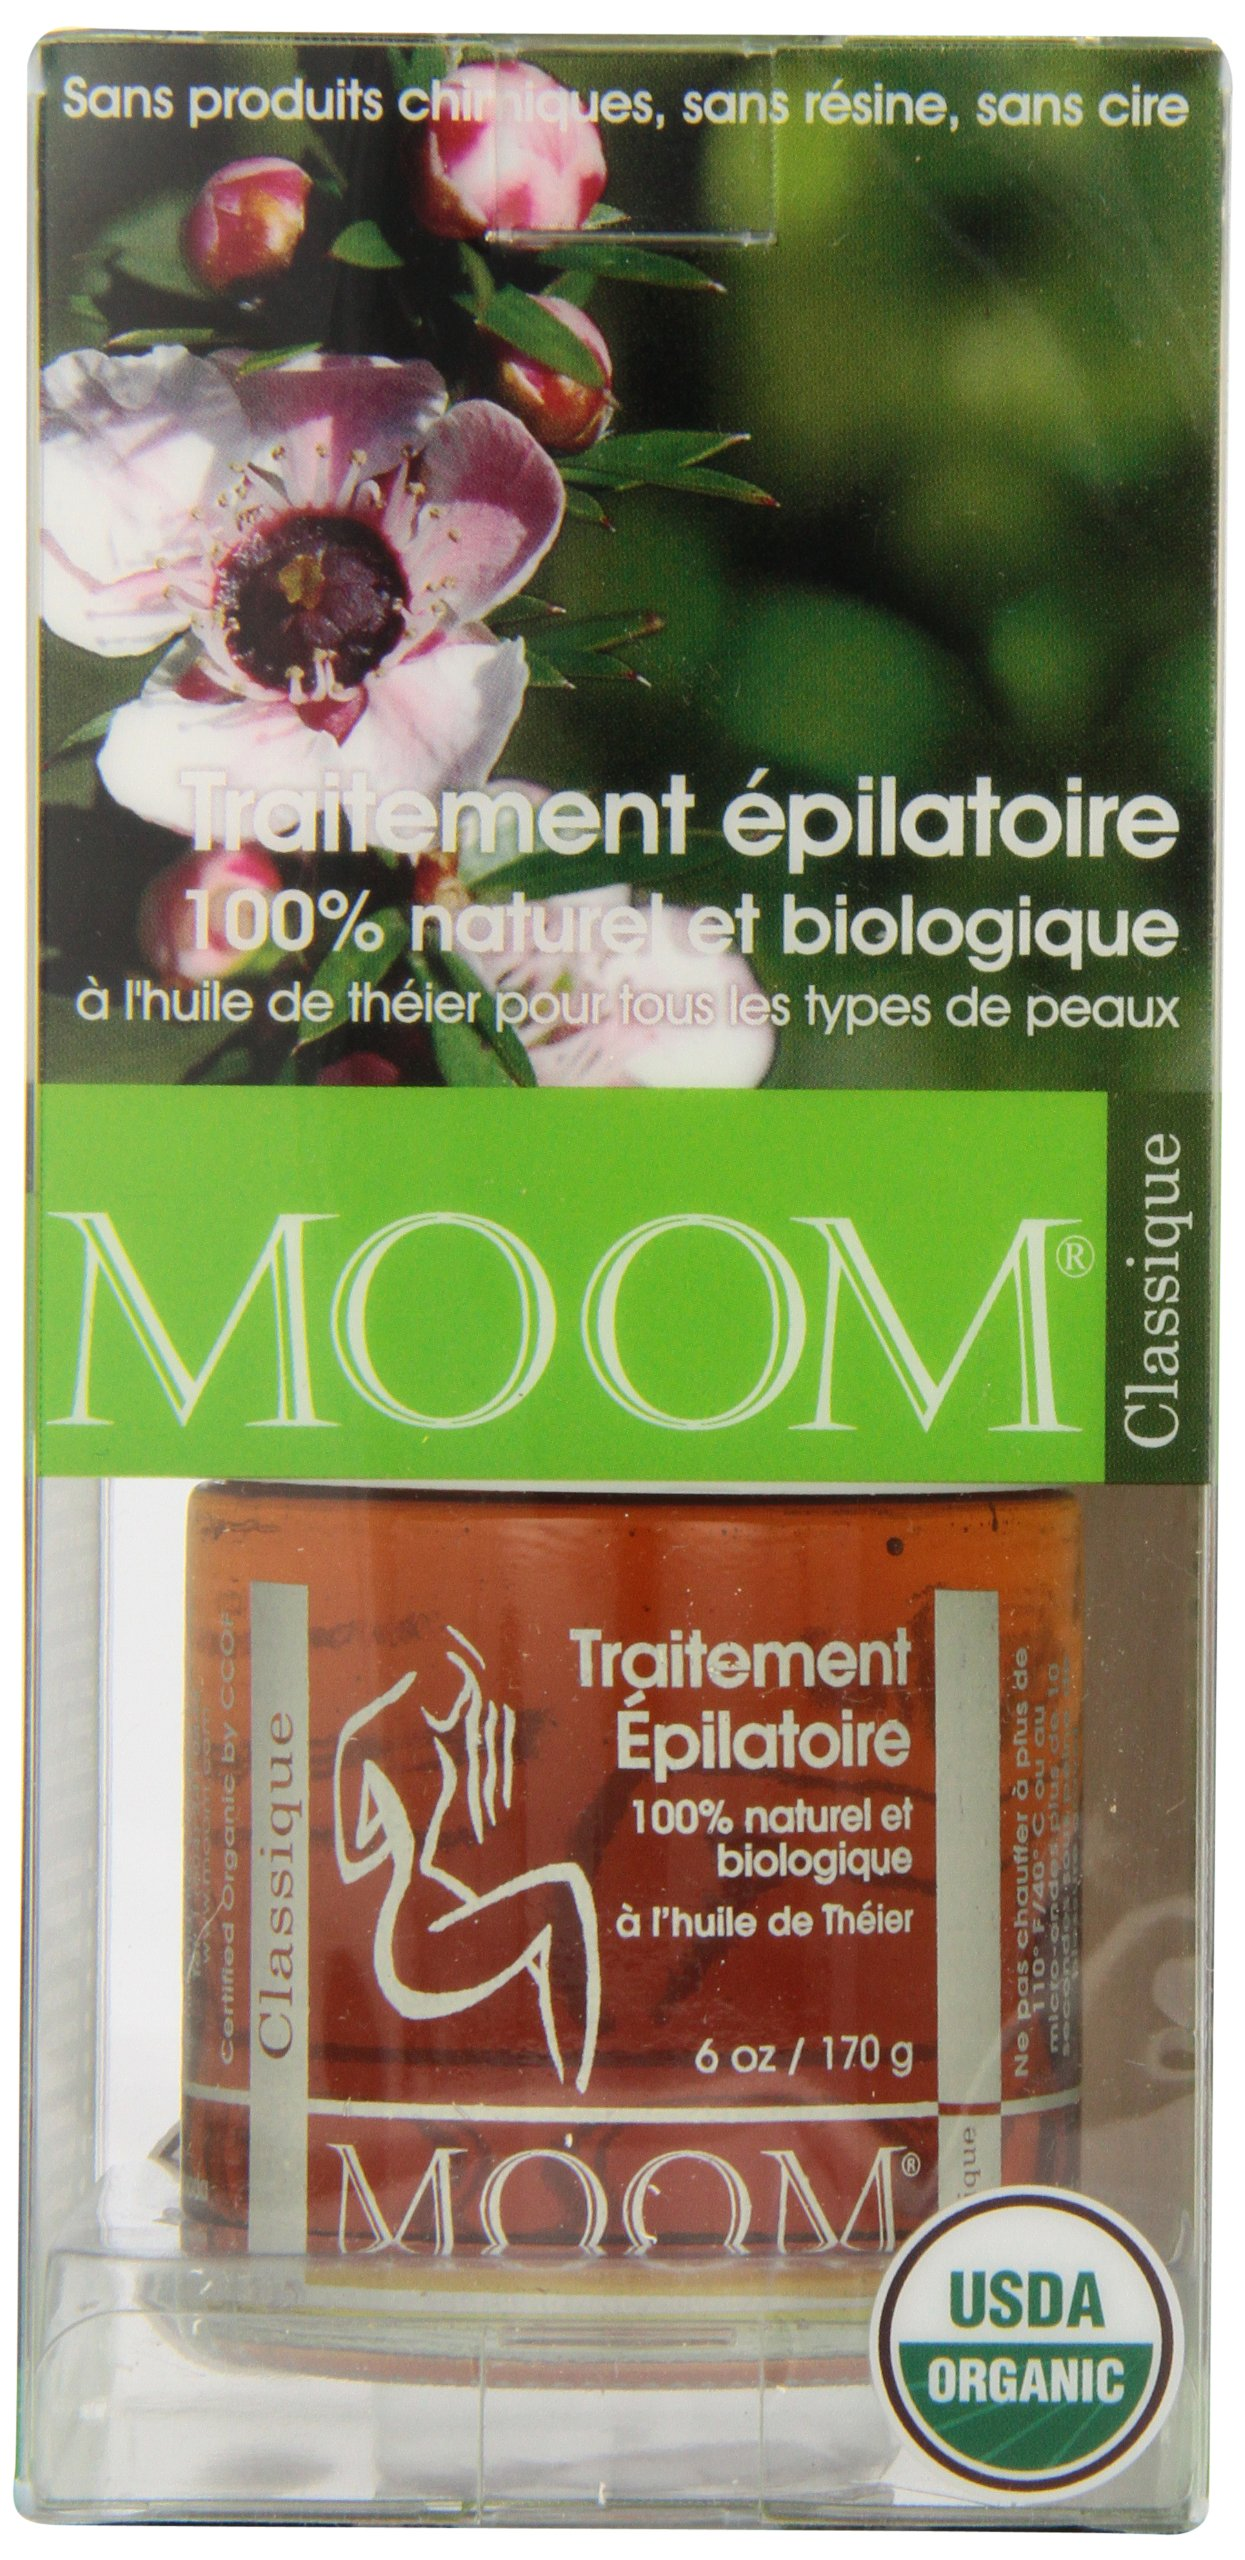 Moom Organic Hair Removal Kit, Tea Tree, 6-Ounce Package by Moom (Image #4)